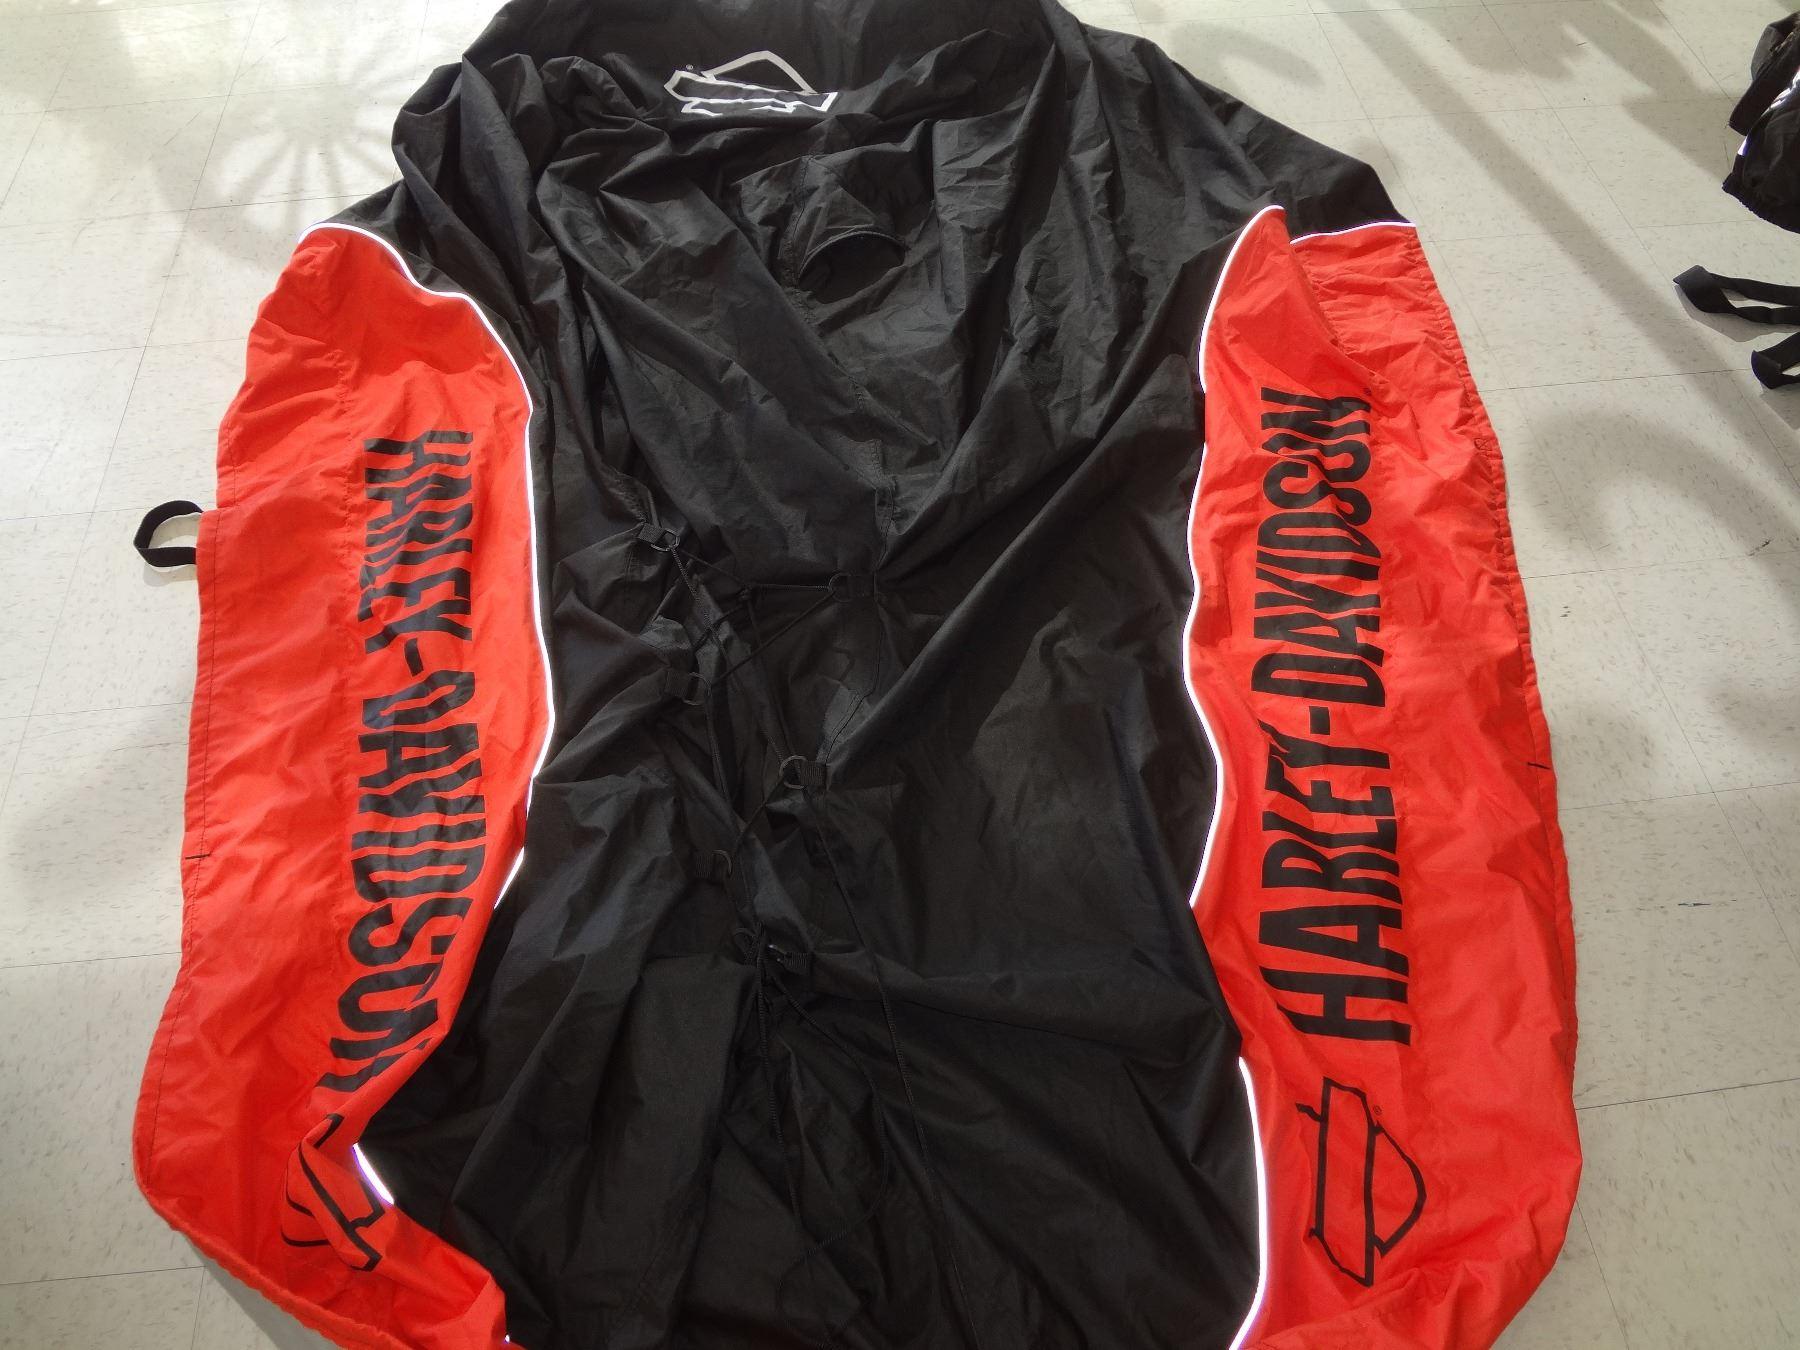 Harley Davidson Bike Covers >> Harley Davidson Bike Cover